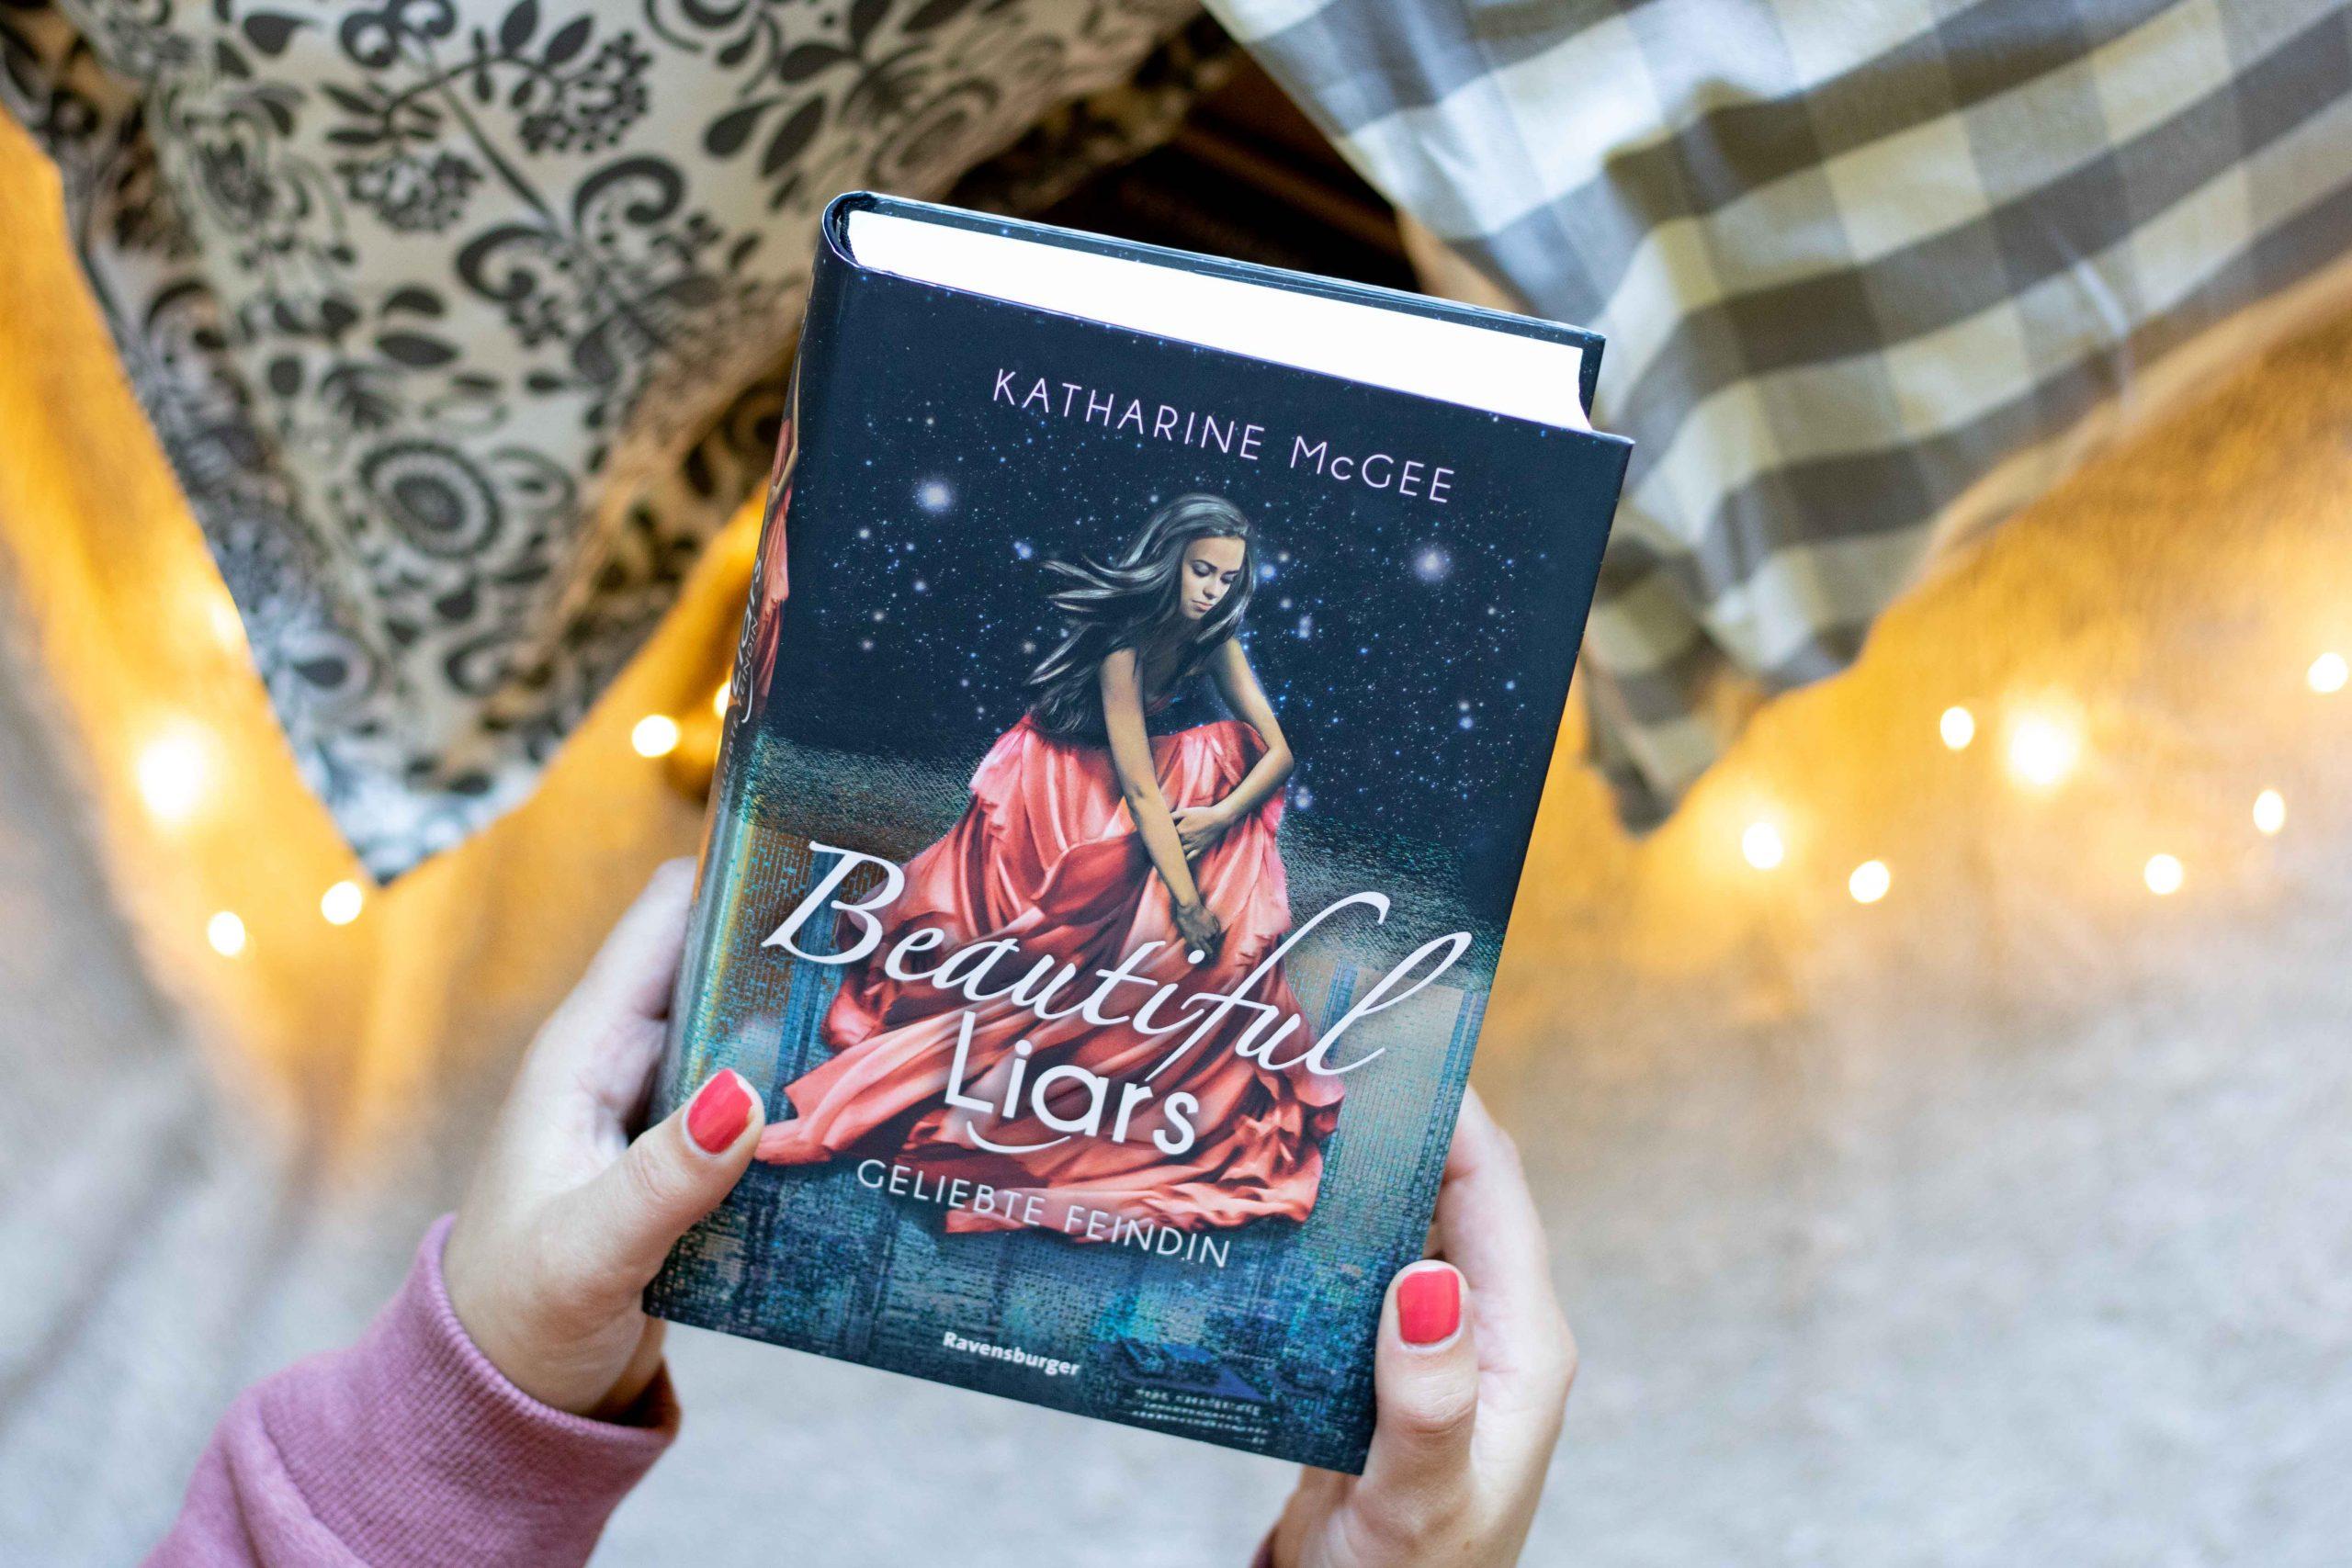 Beautiful Liars – Geliebte Feindin | Katharine McGee